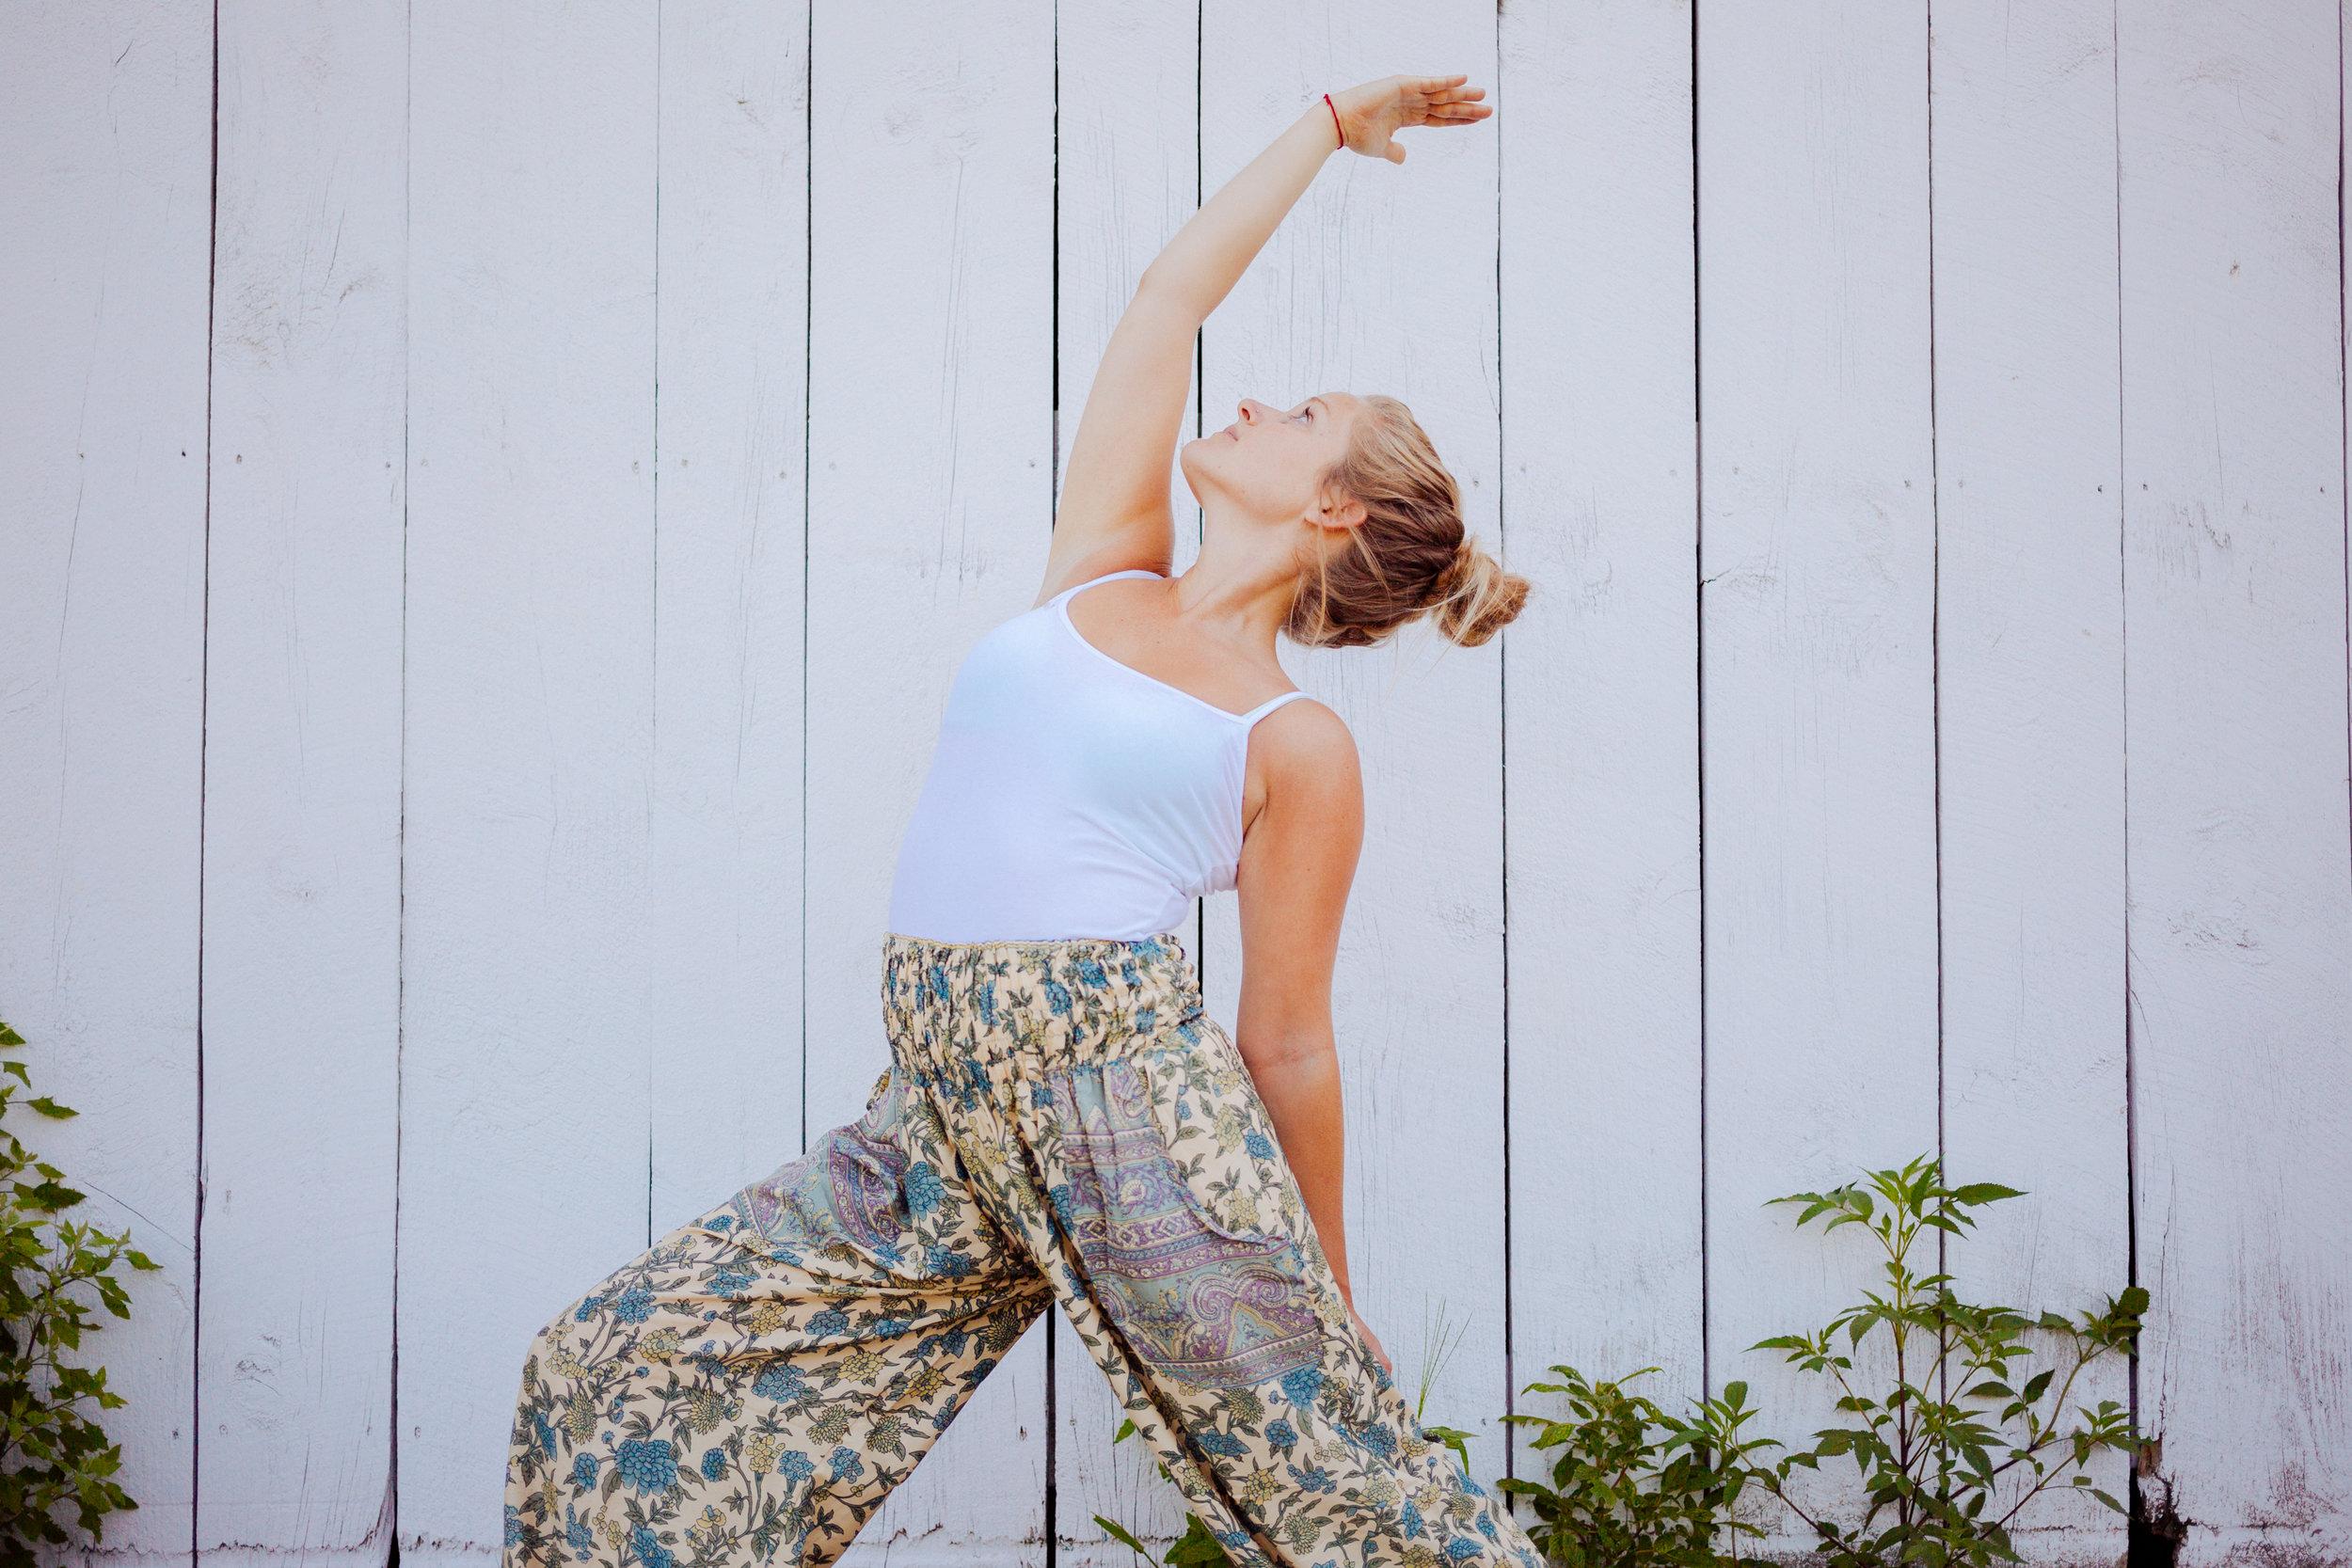 Monica.Justesen.Photography.08.16.Boston.Yoga.34.jpg